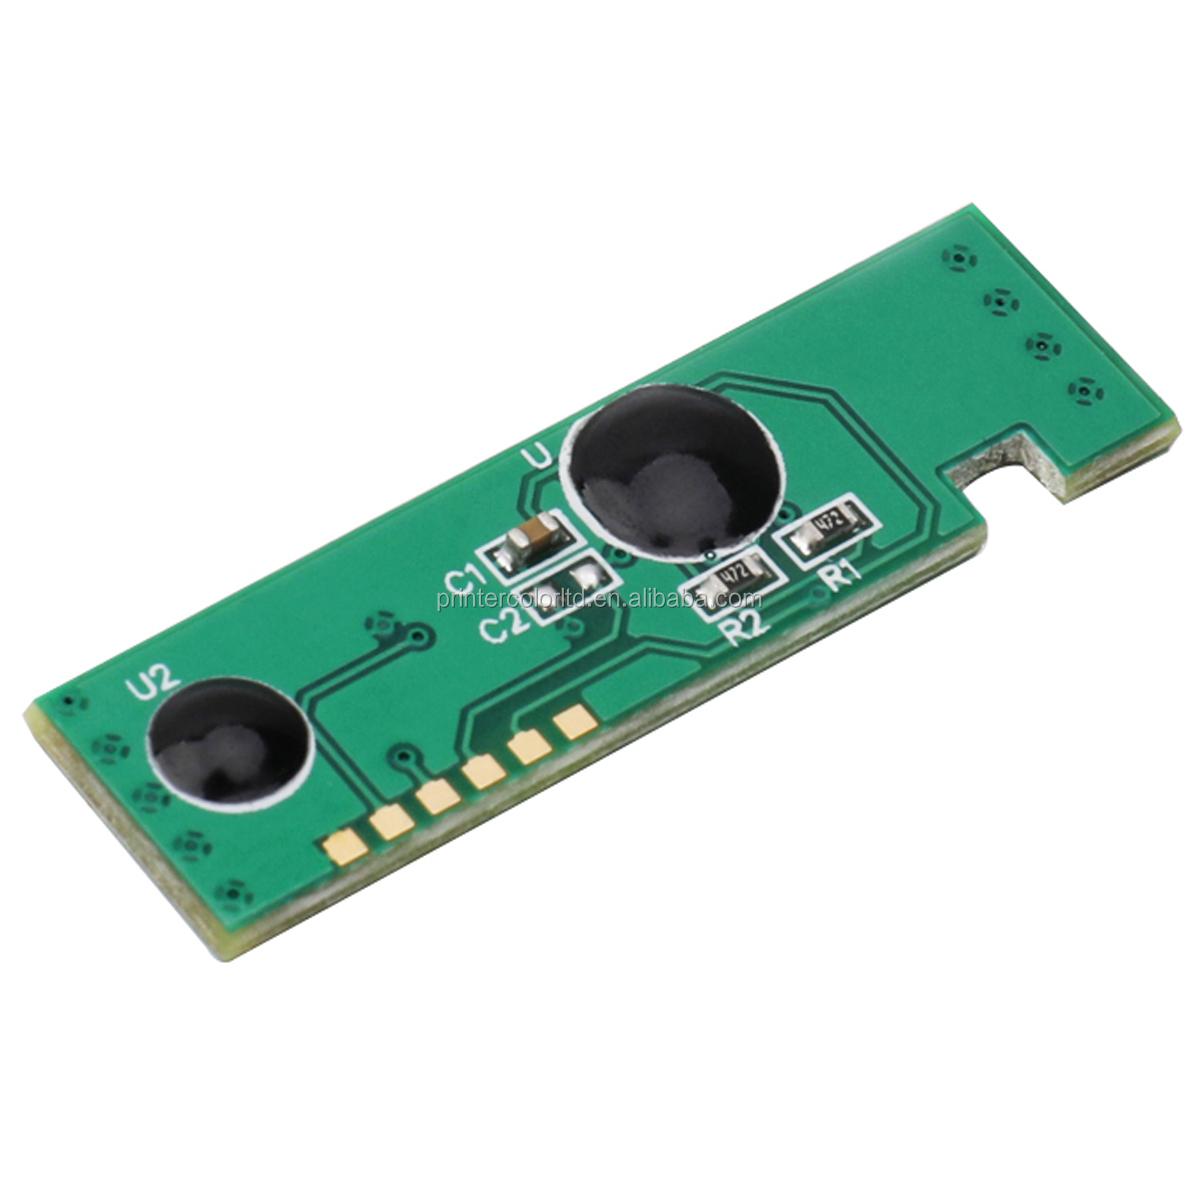 toner for Samsung Xpress C410 W D 406 S CLT Y406S SL-C 413-W 413 ELS XAA XIL SEE laser black refill CARTRIDGE-lowest shipping